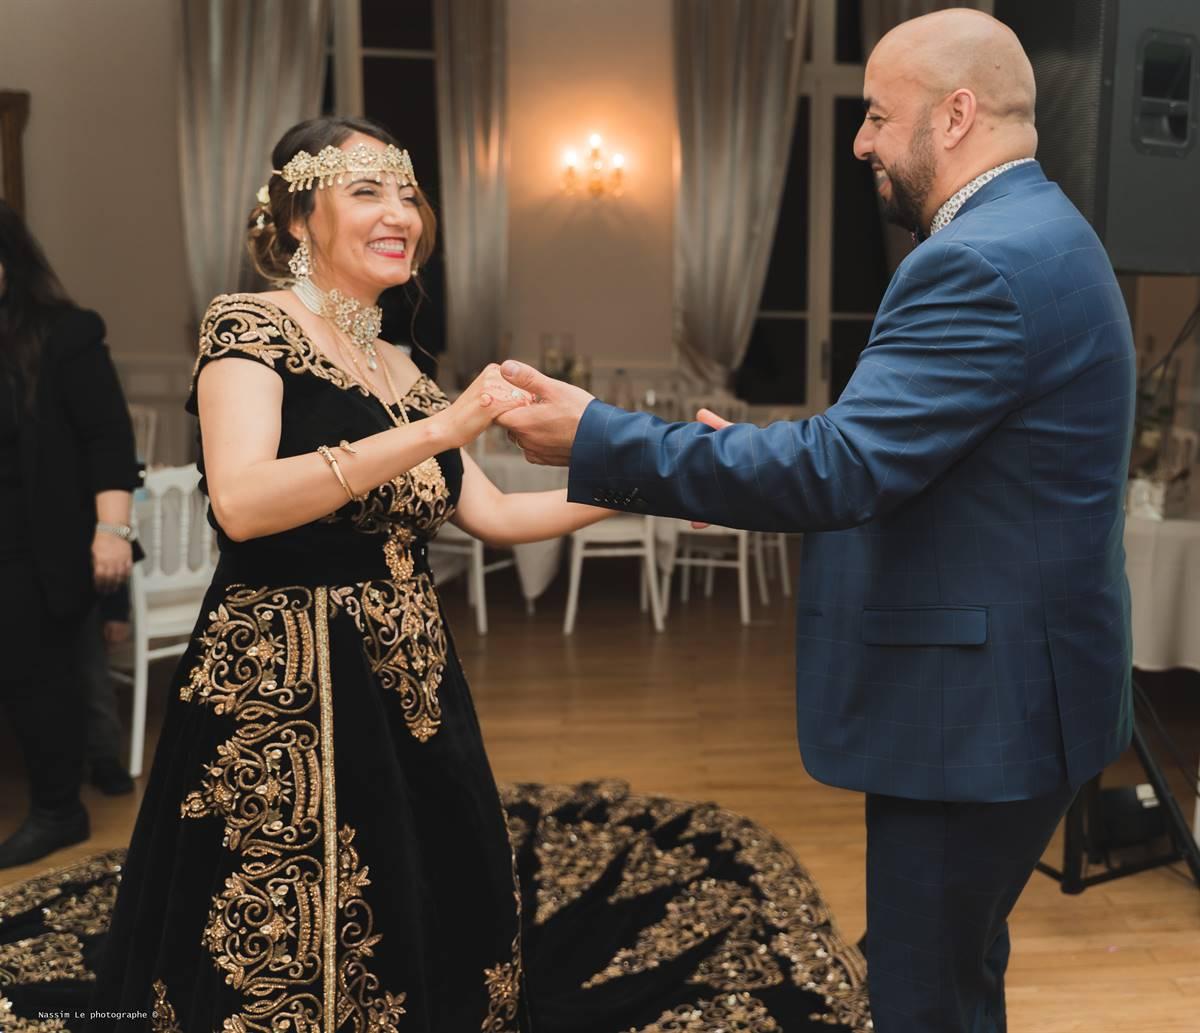 Pourquoi choisir ce Photographe mariage oriental 74